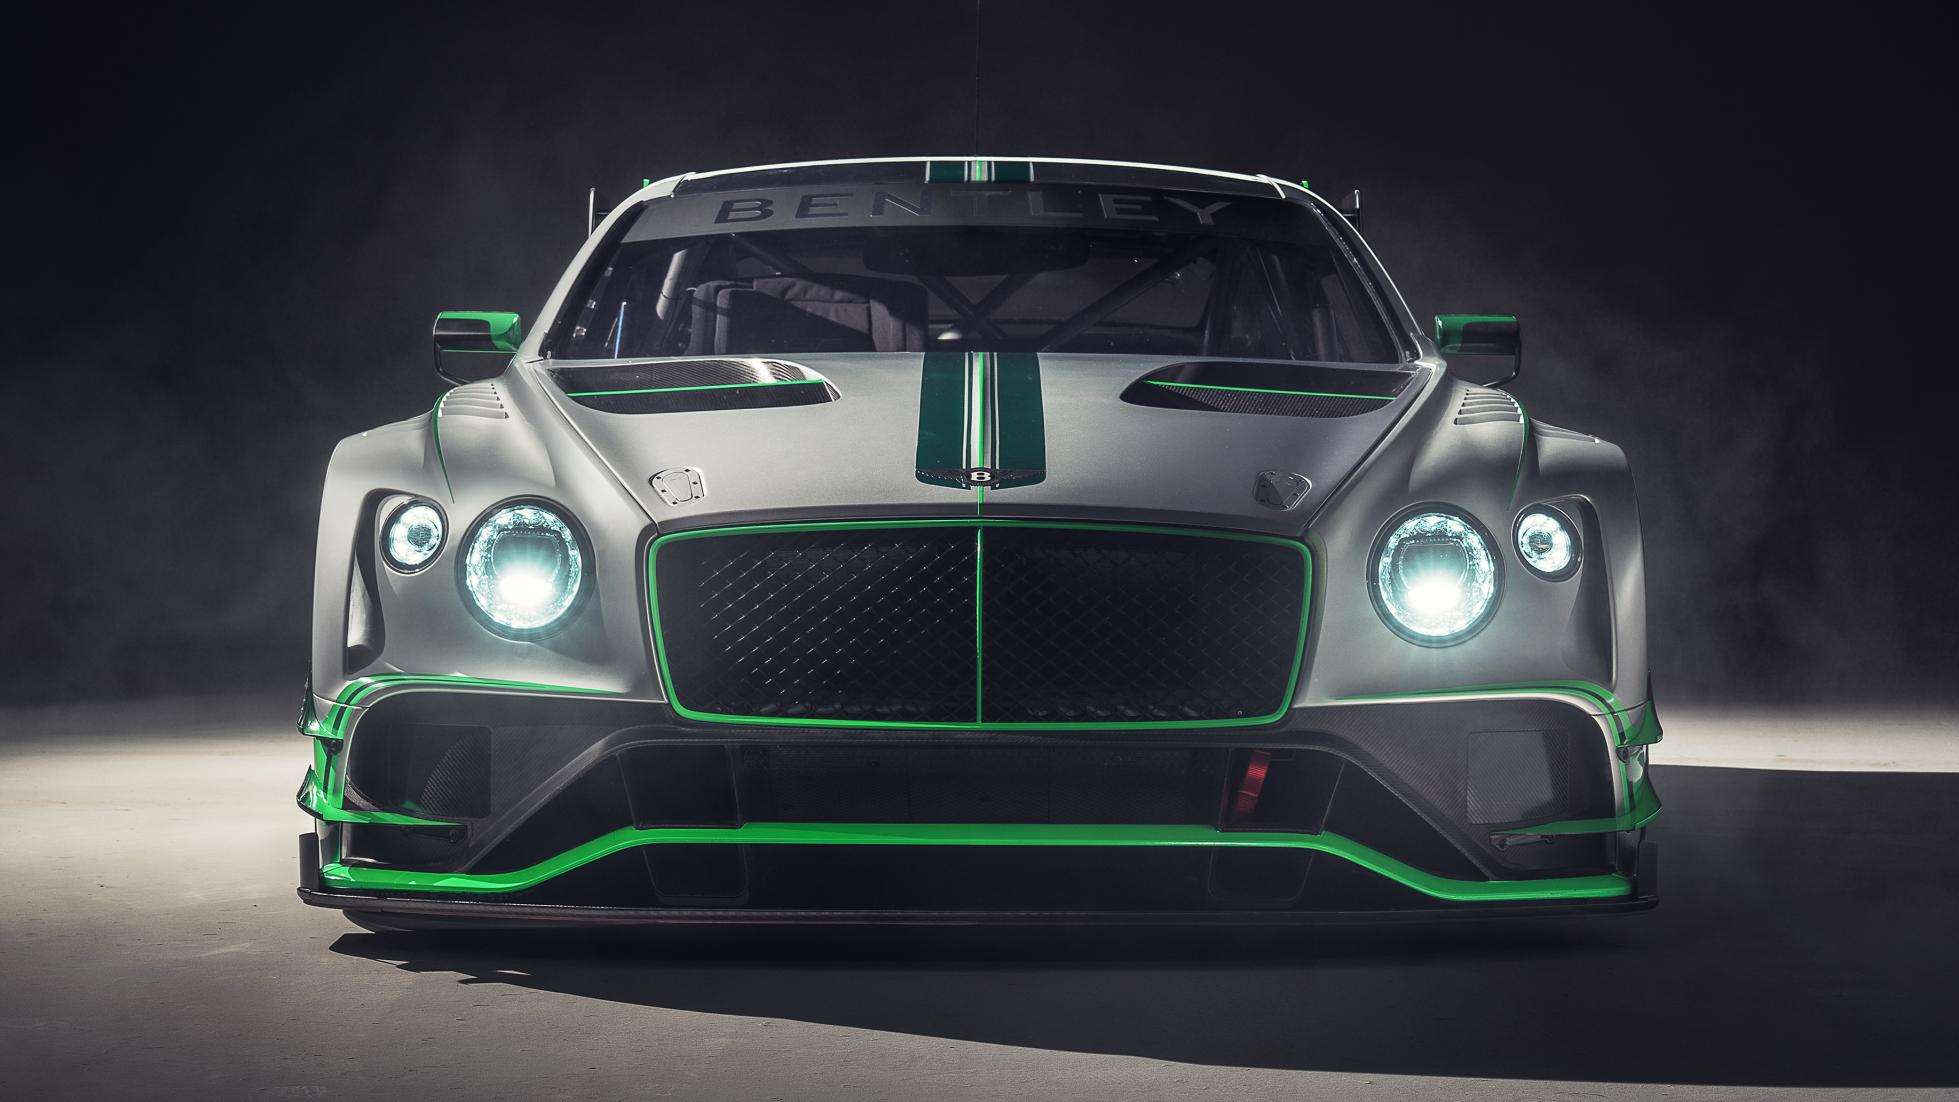 new bentley continental gt3   4 مشخصات نسخه مسابقهای کانتیننتال GT3   اجاره ماشین